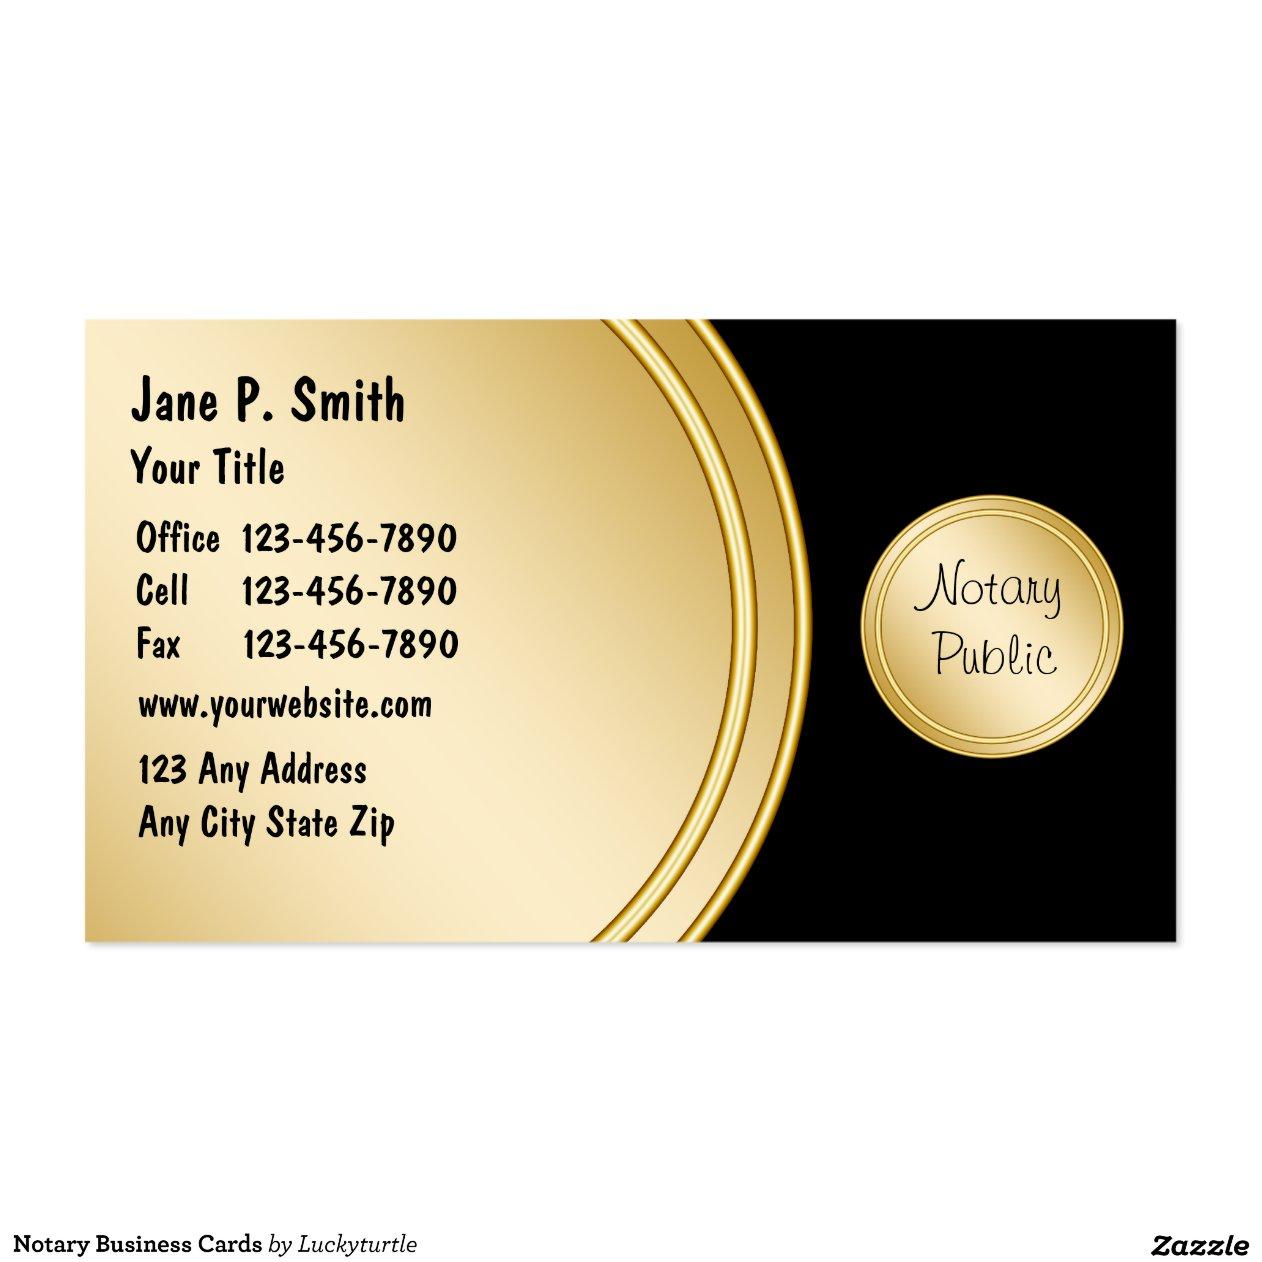 Notary Business Cards R94fc7c0c98bc4acb9e8f63c443892c4e